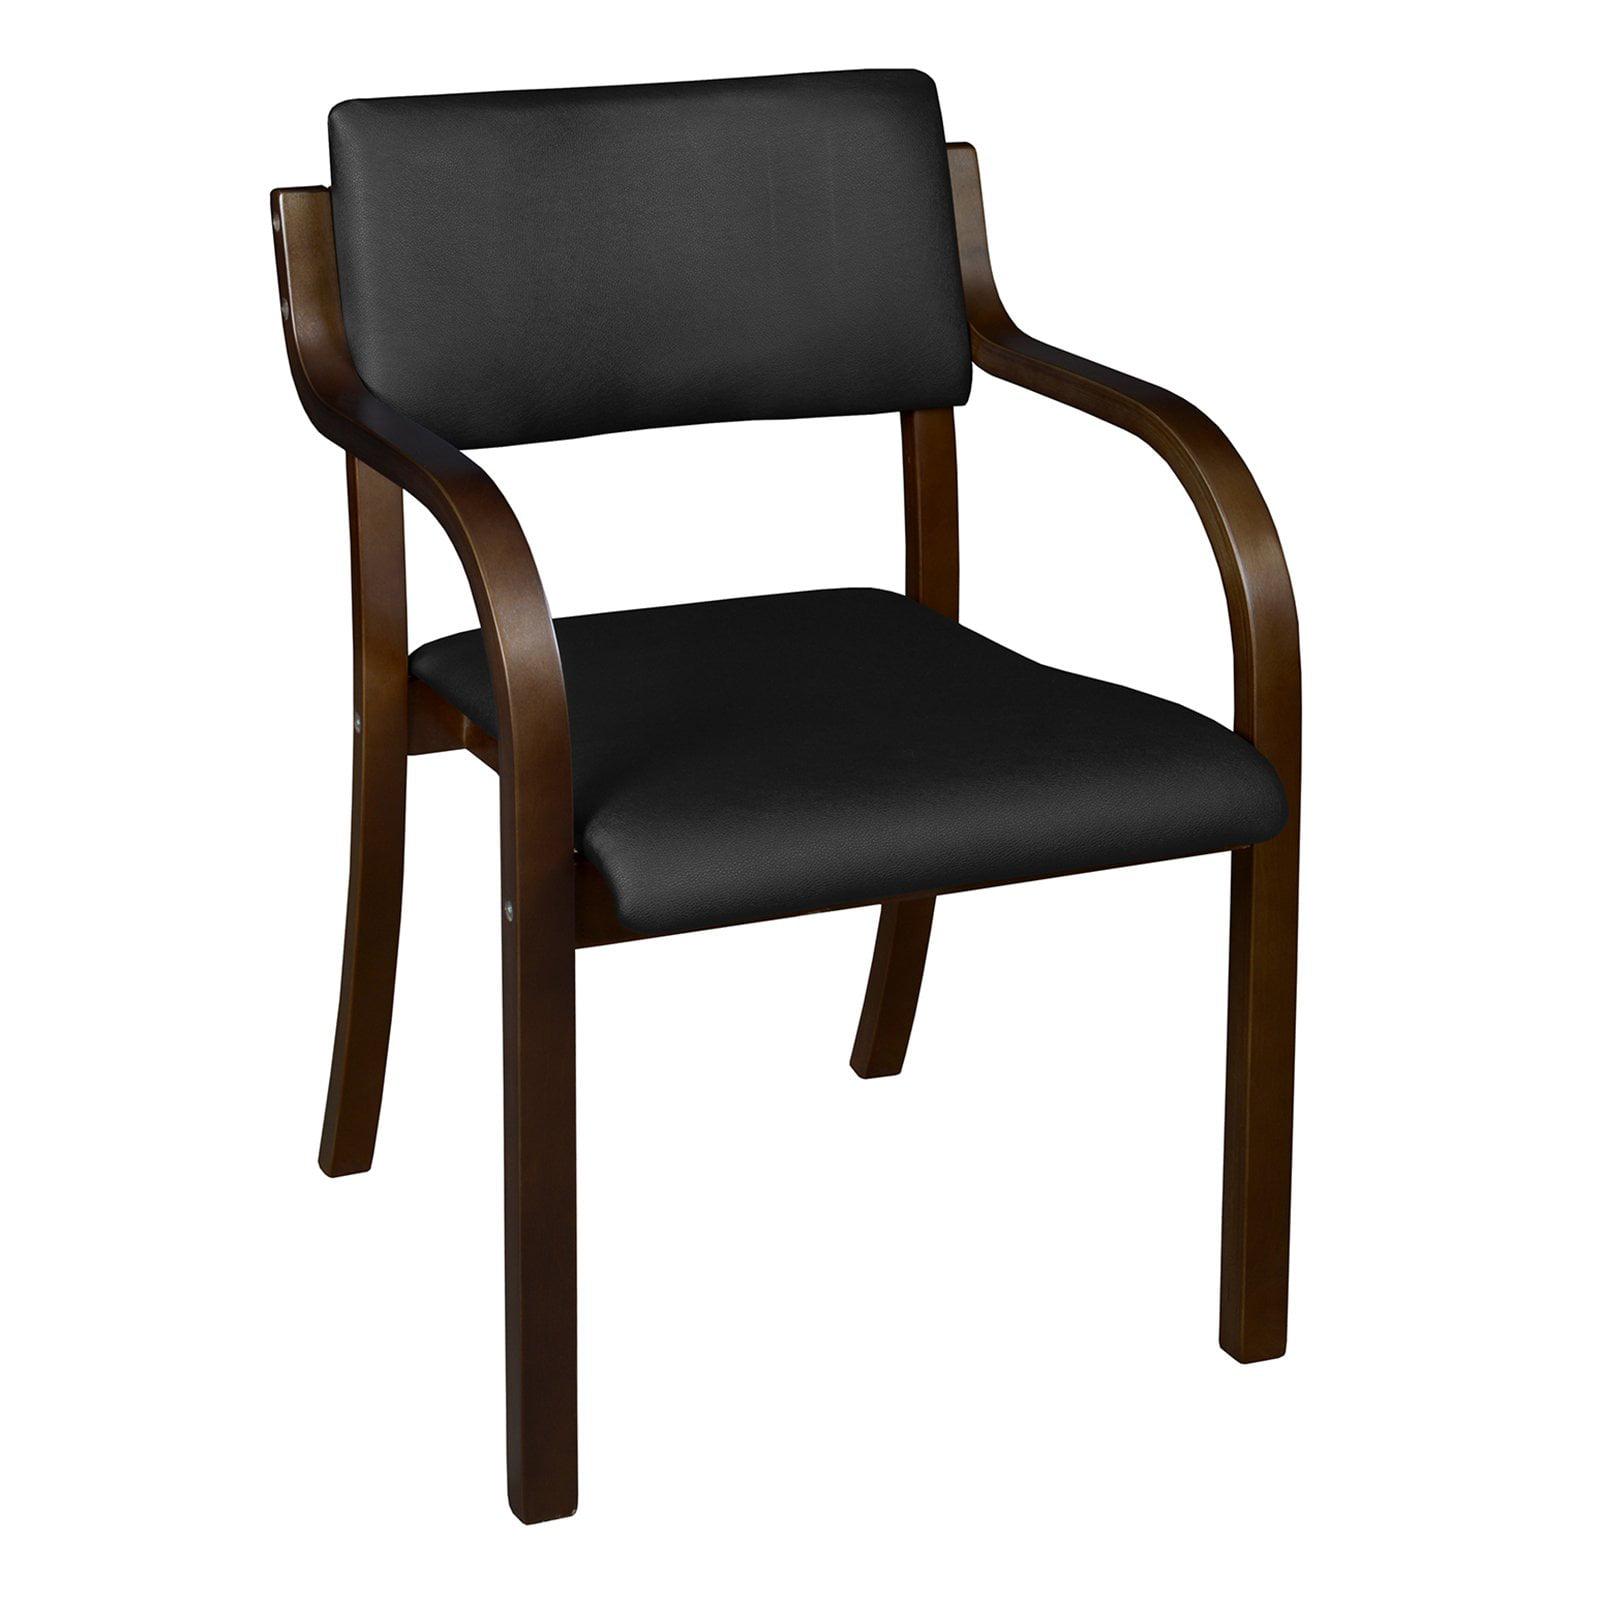 Niche Mia Bentwood Stack Chair- Mocha Walnut/Black Vinyl